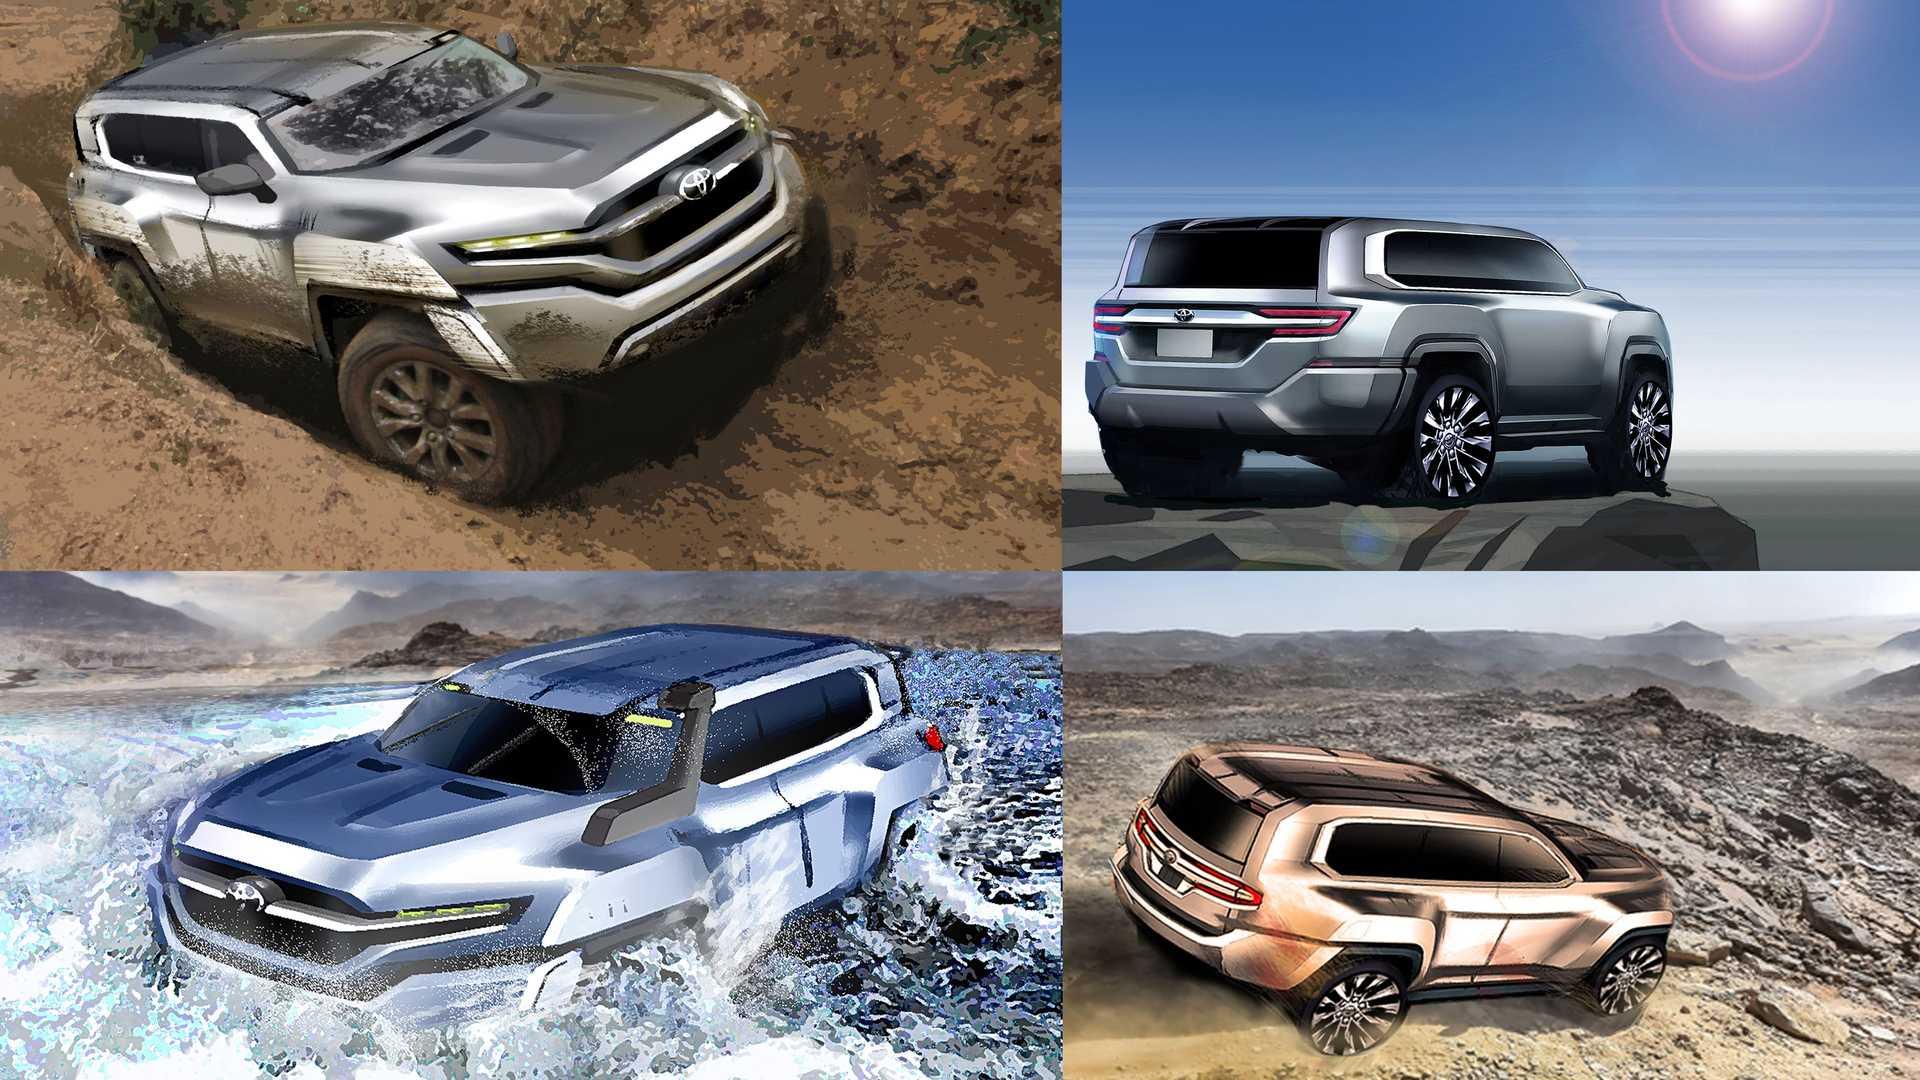 Toyota-Land-Cruiser-design-sketches-2